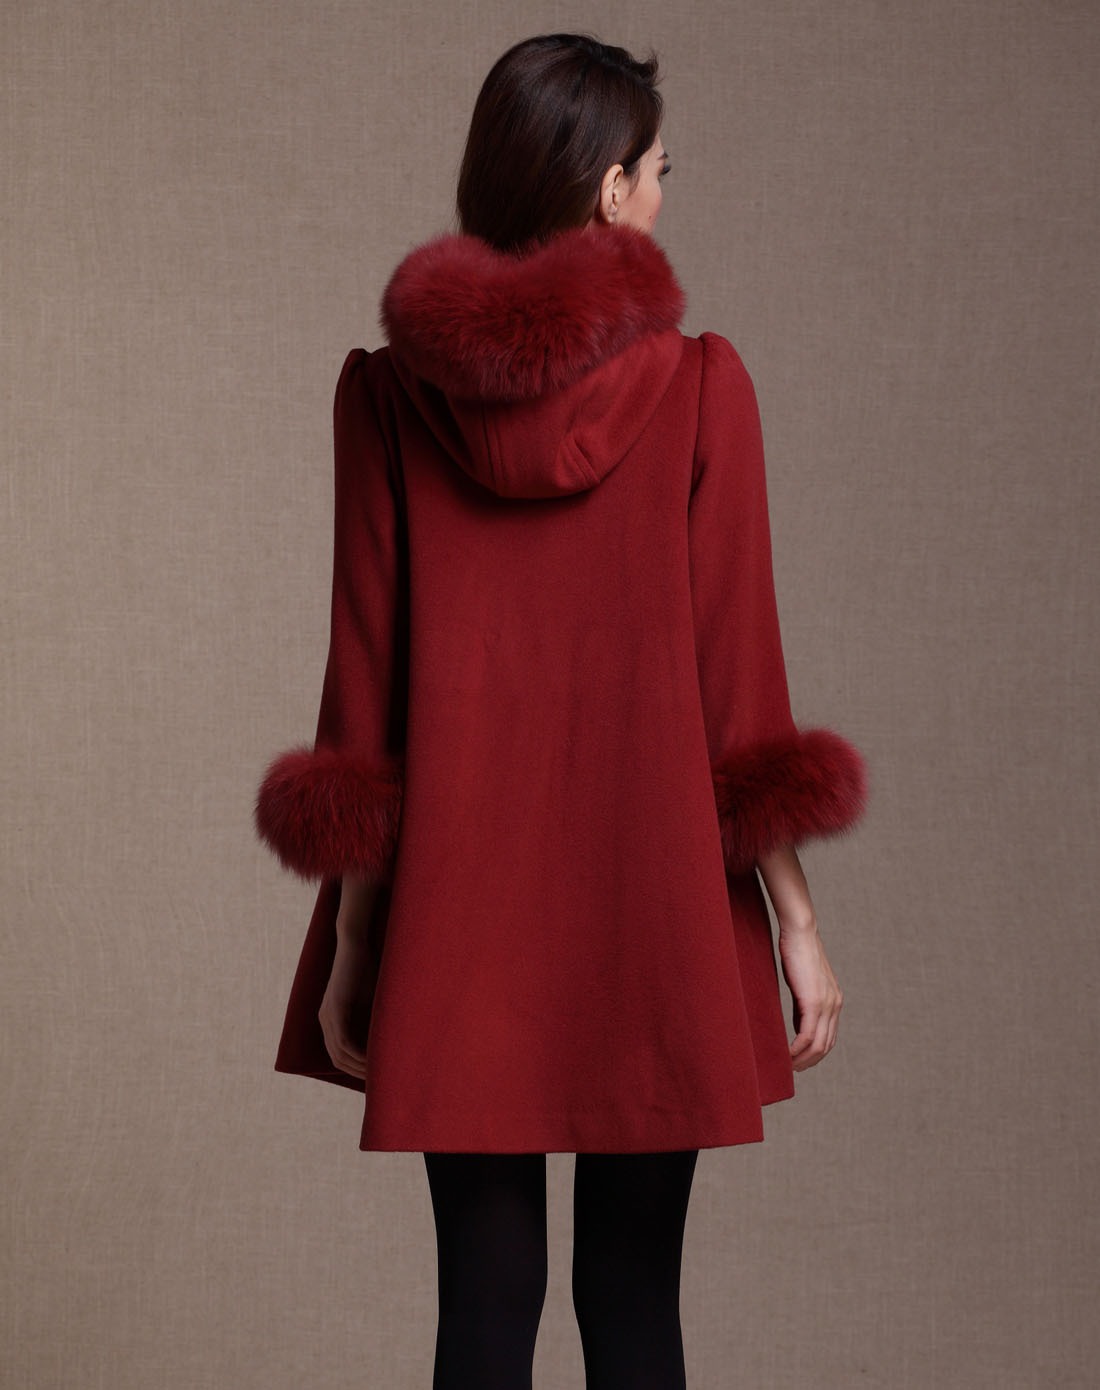 zimmur女款暗红色大衣z12qdc691r3